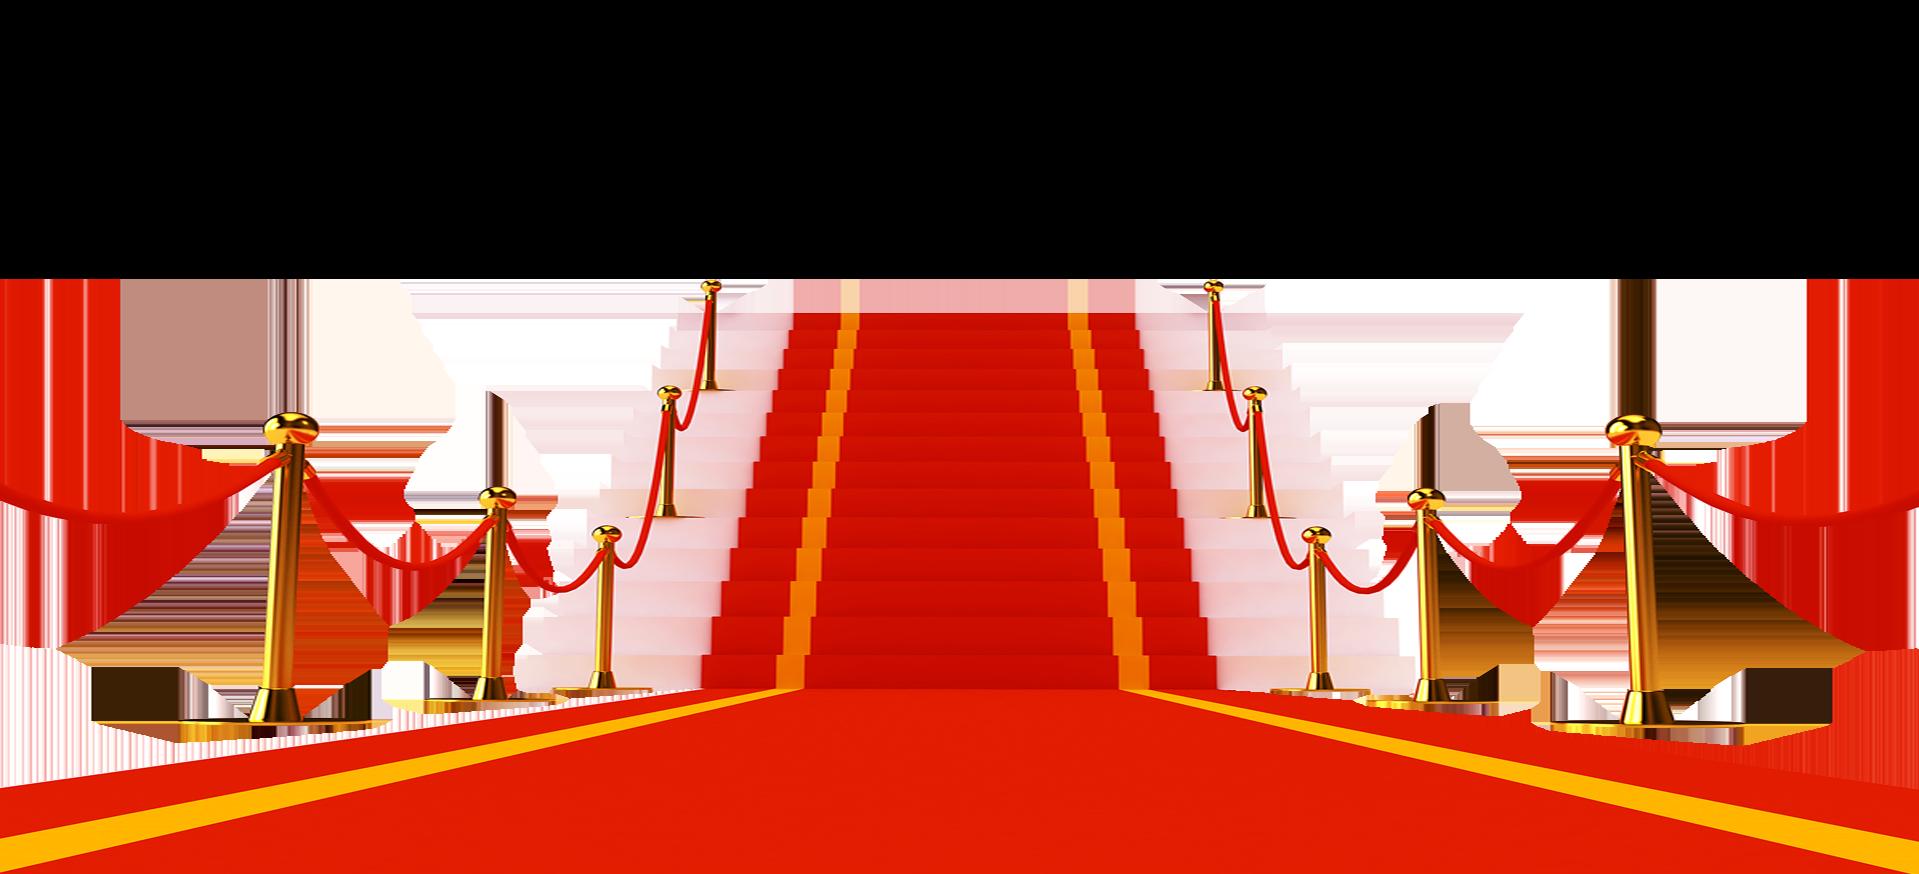 Curtains clipart red carpet, Curtains red carpet Transparent.